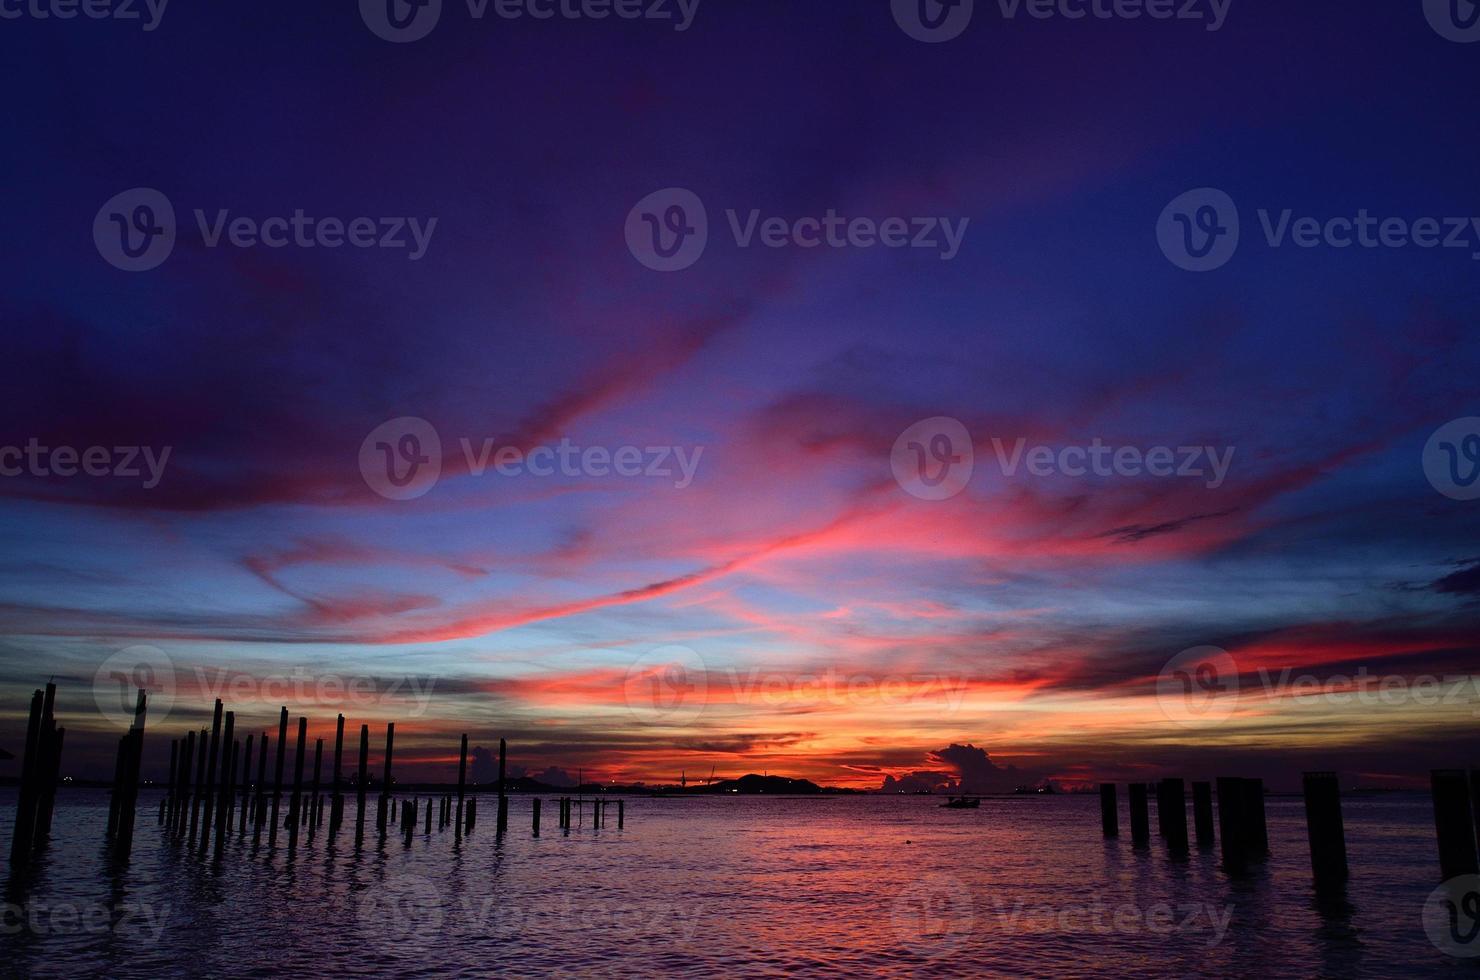 Sichang island silhouette with twilight sky photo